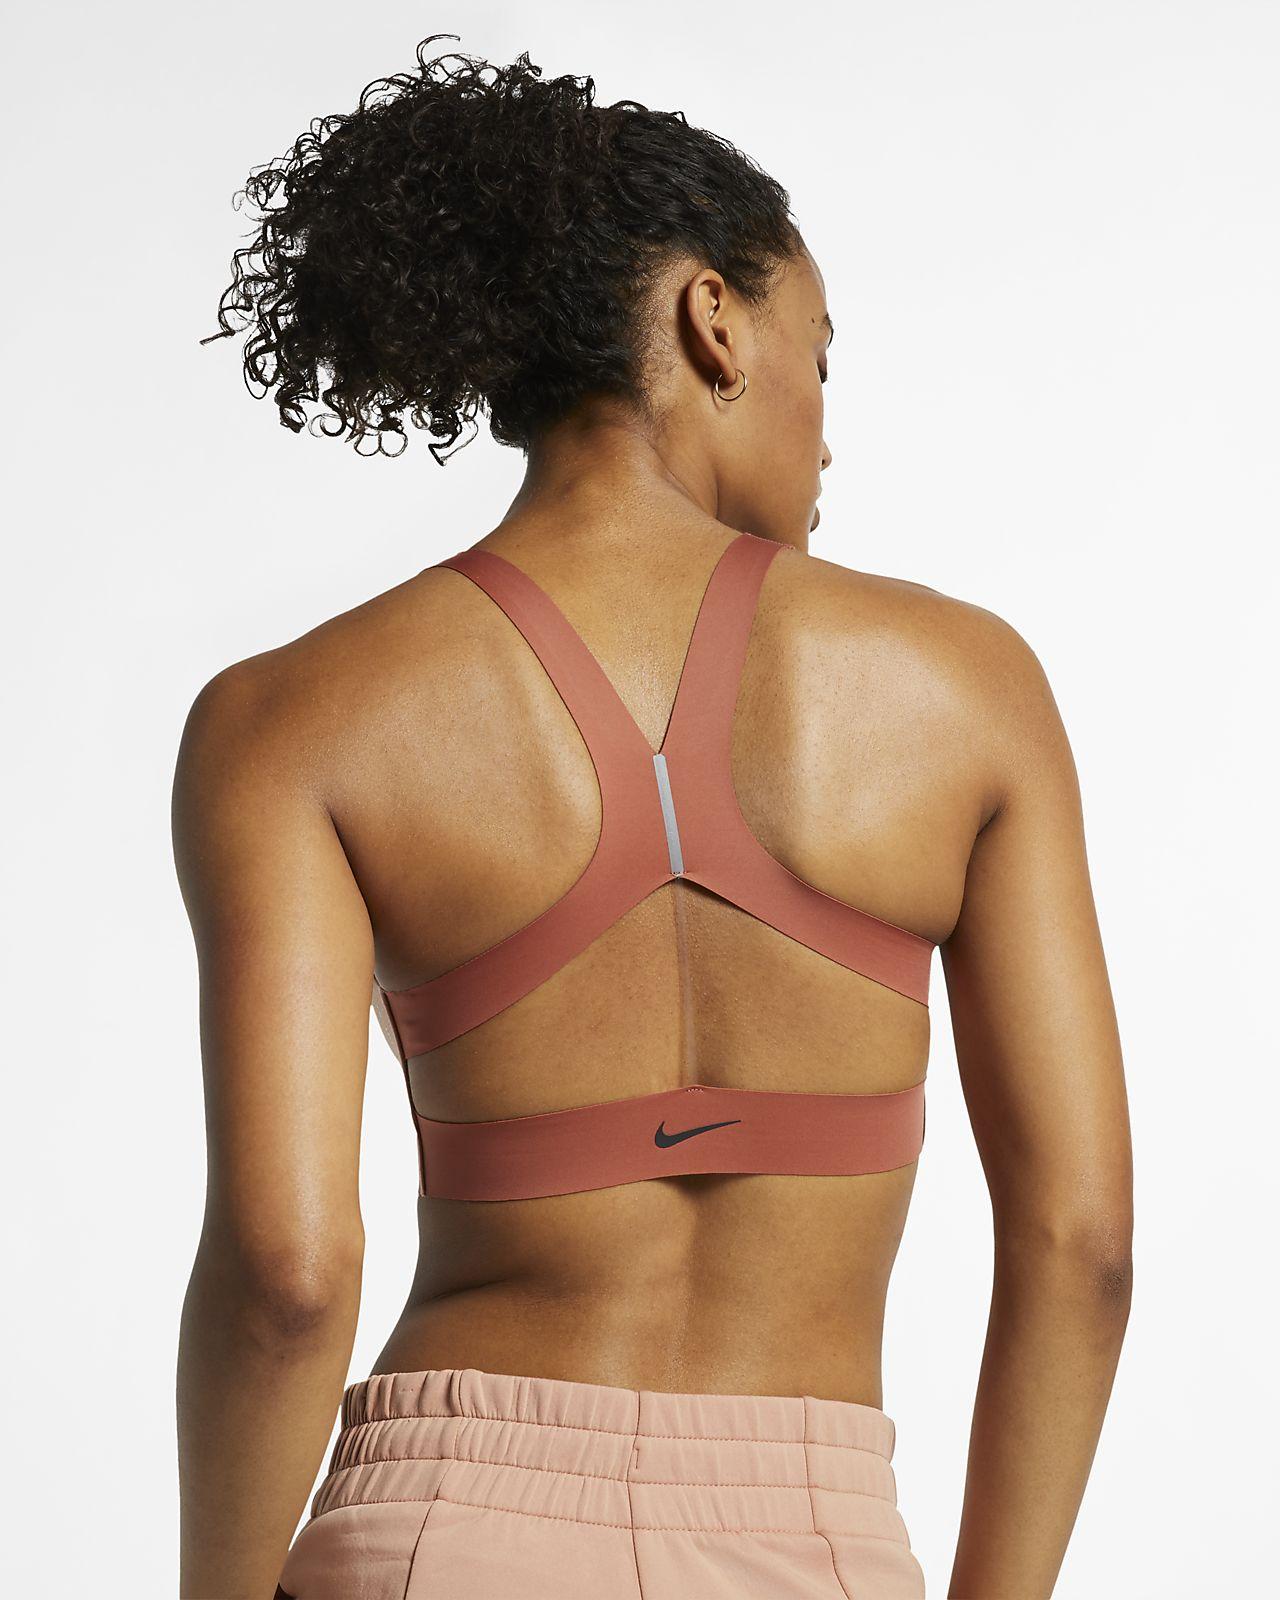 designer fashion 42659 17bf6 ... Nike Breathe Tech Pack Women s Medium Support Sports Bra